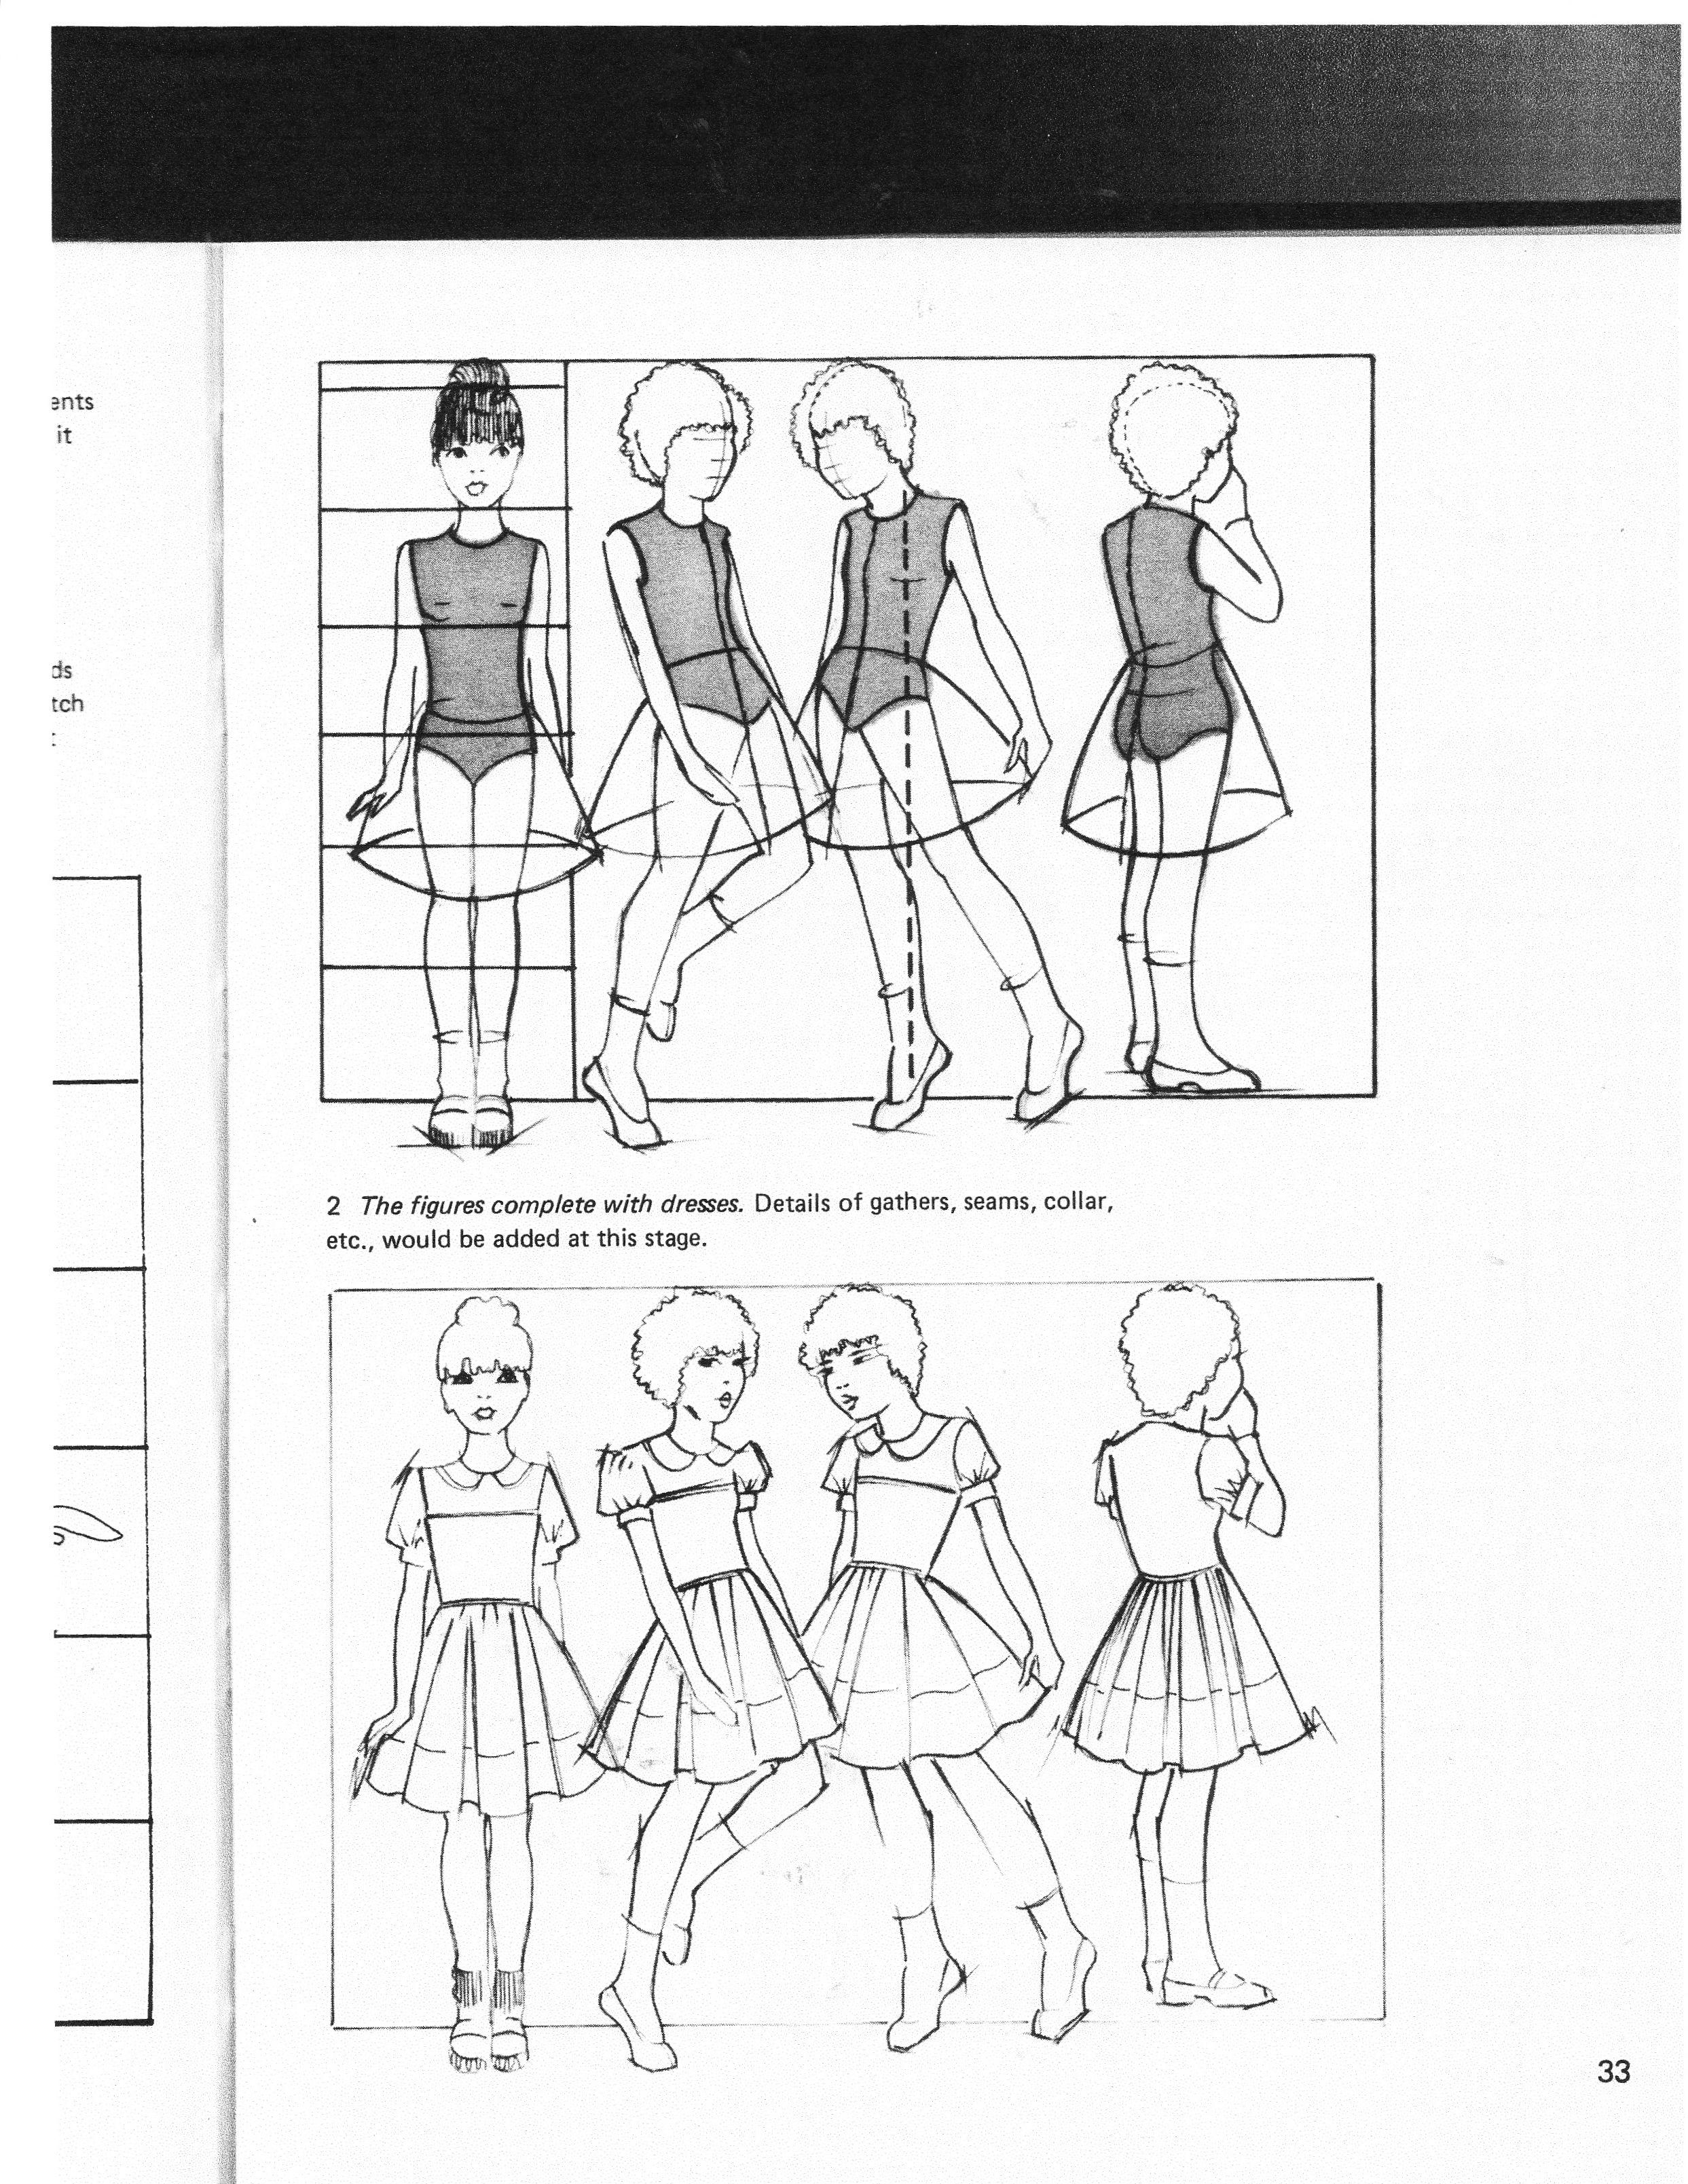 Vintage Kids Fashion Design Book Desenho De Moda Desenhos De Moda Moda Infantil